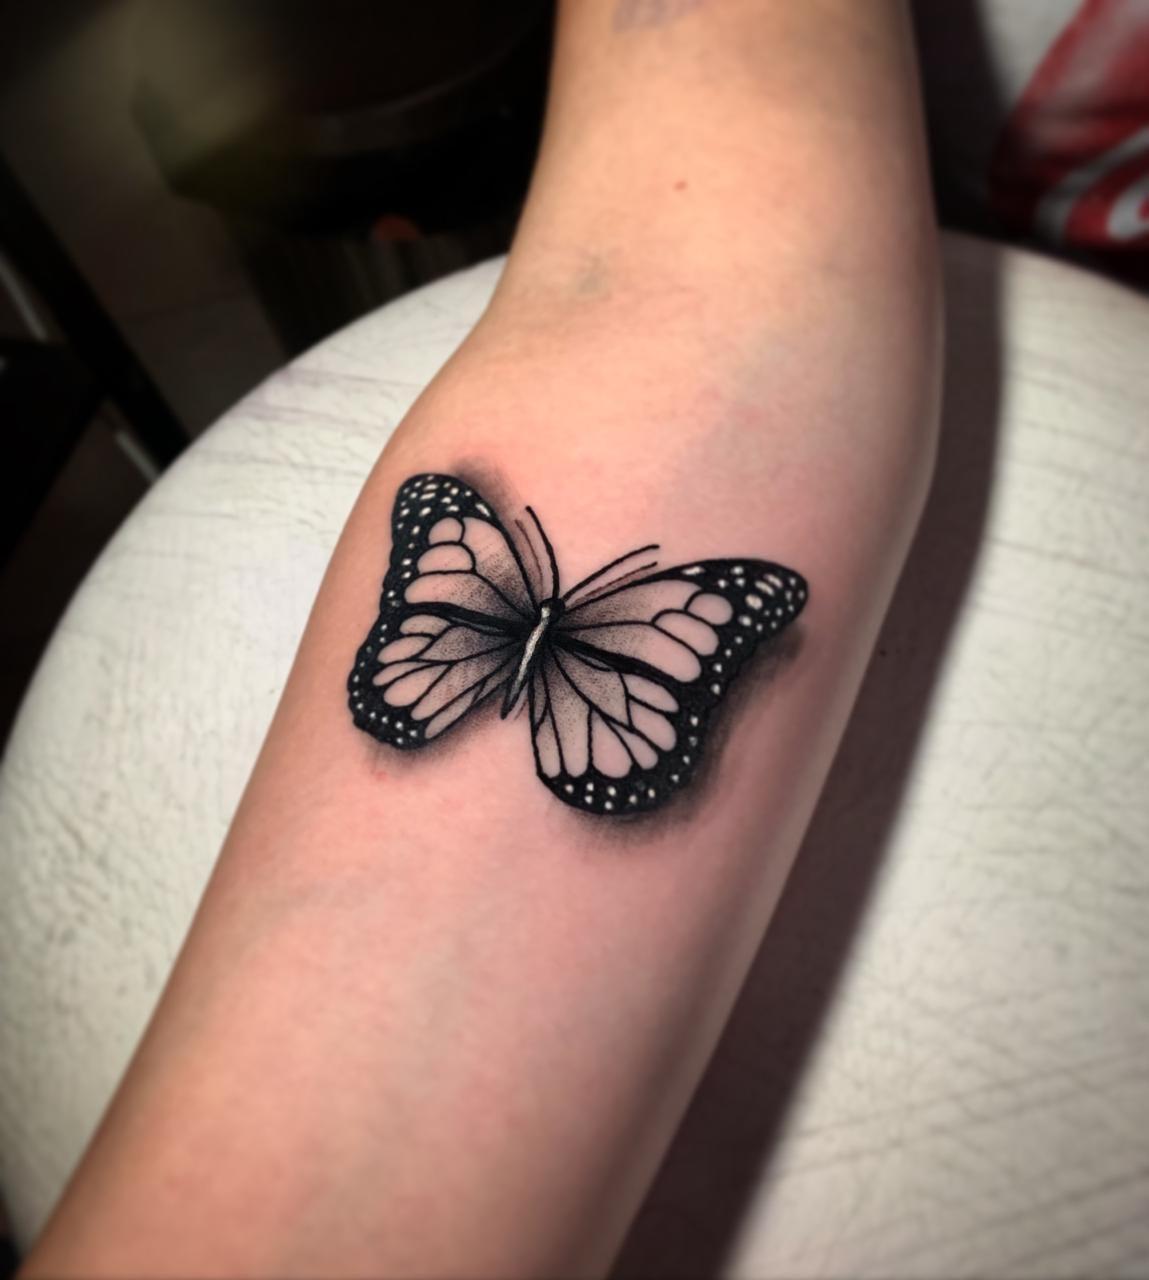 realismo, mariposa, butterfly, black and grey, byn, tattoos, tatuaje, alicante, santa pola